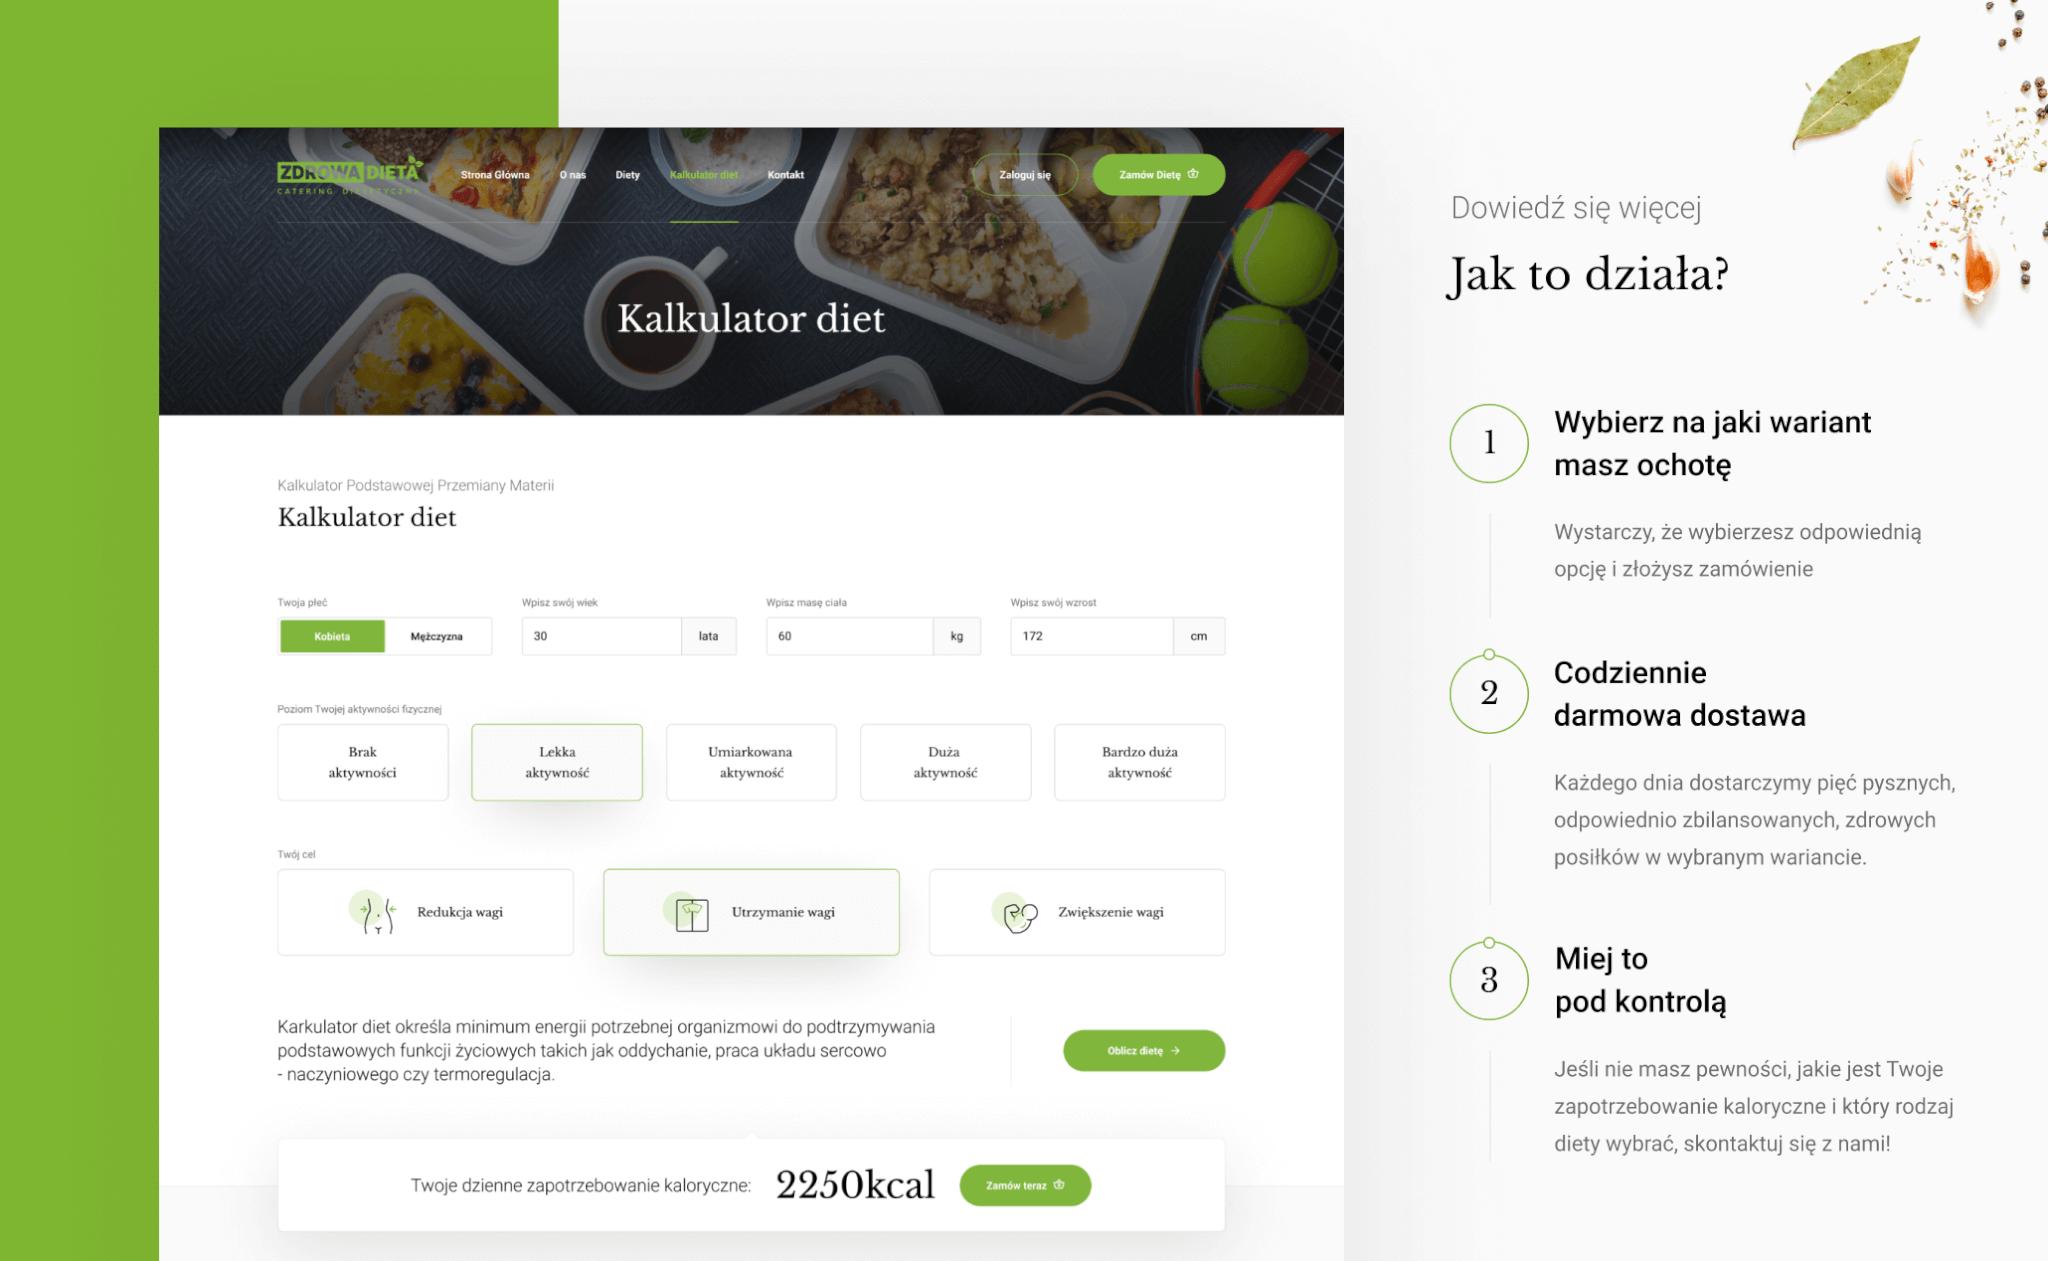 Zdrowa Dieta Catering project